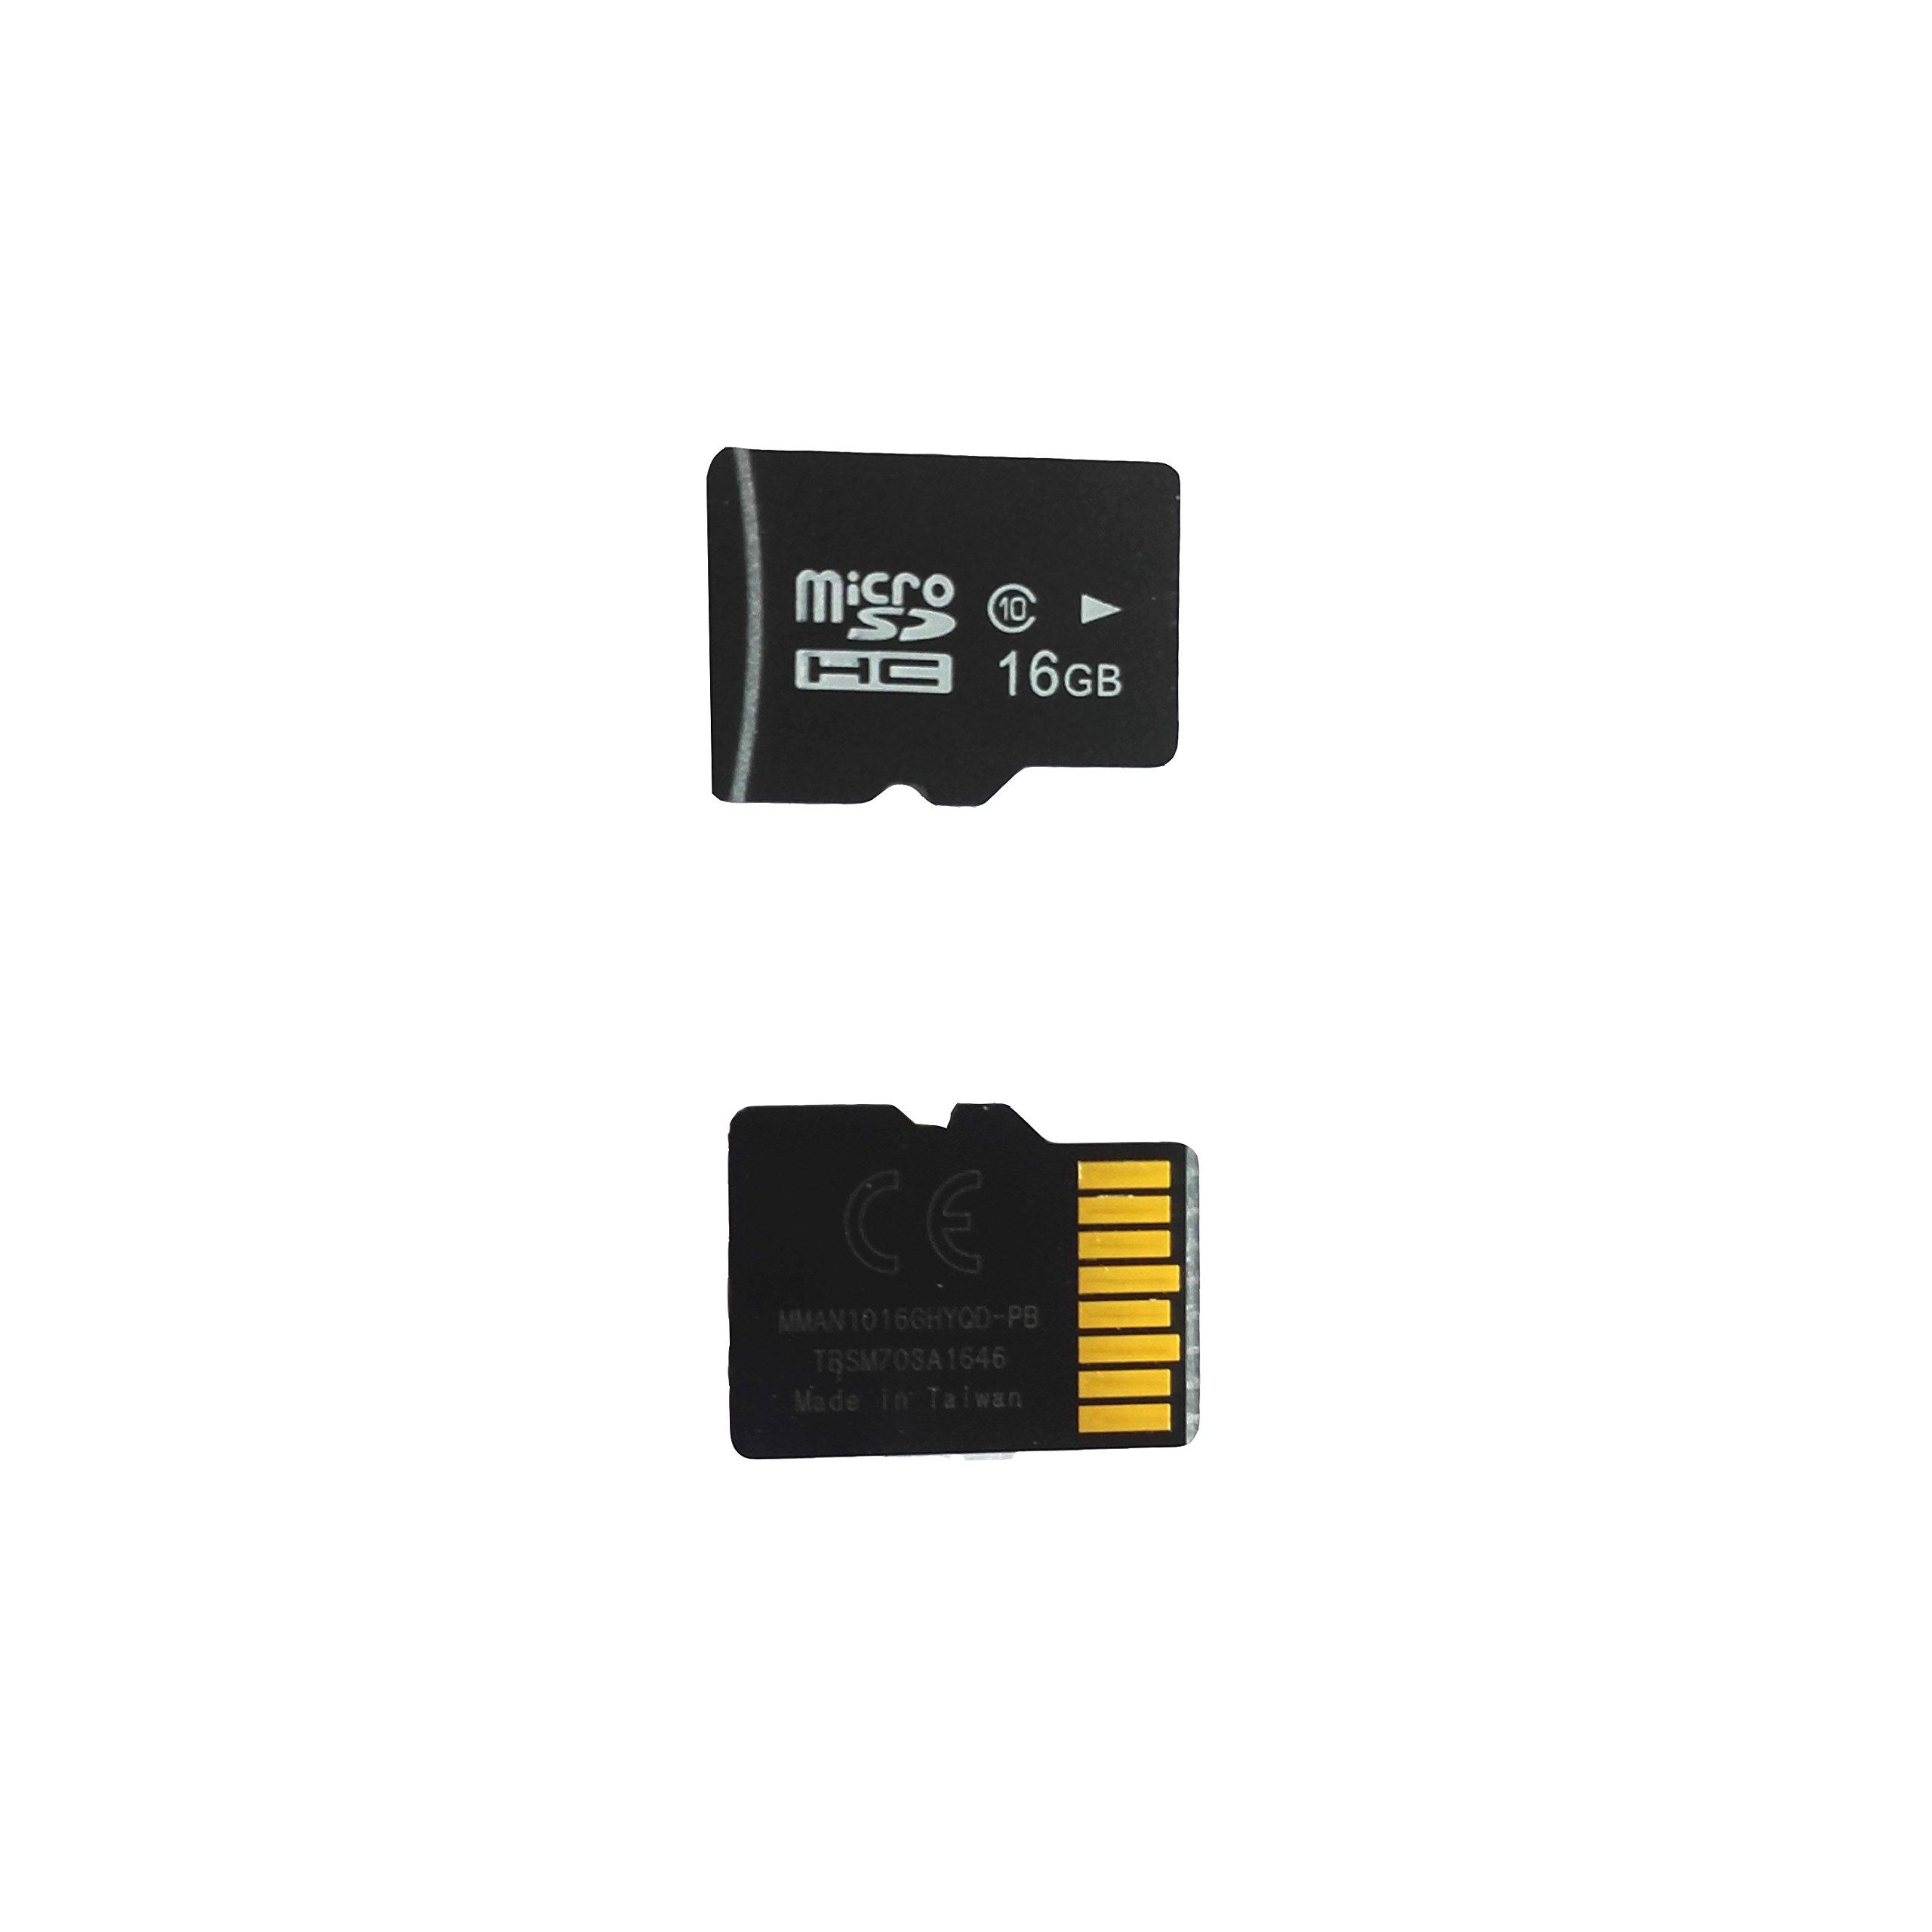 MATECam Memory Card SD Card 16GB 16G Micro SDHC Class10 TF Memory Card